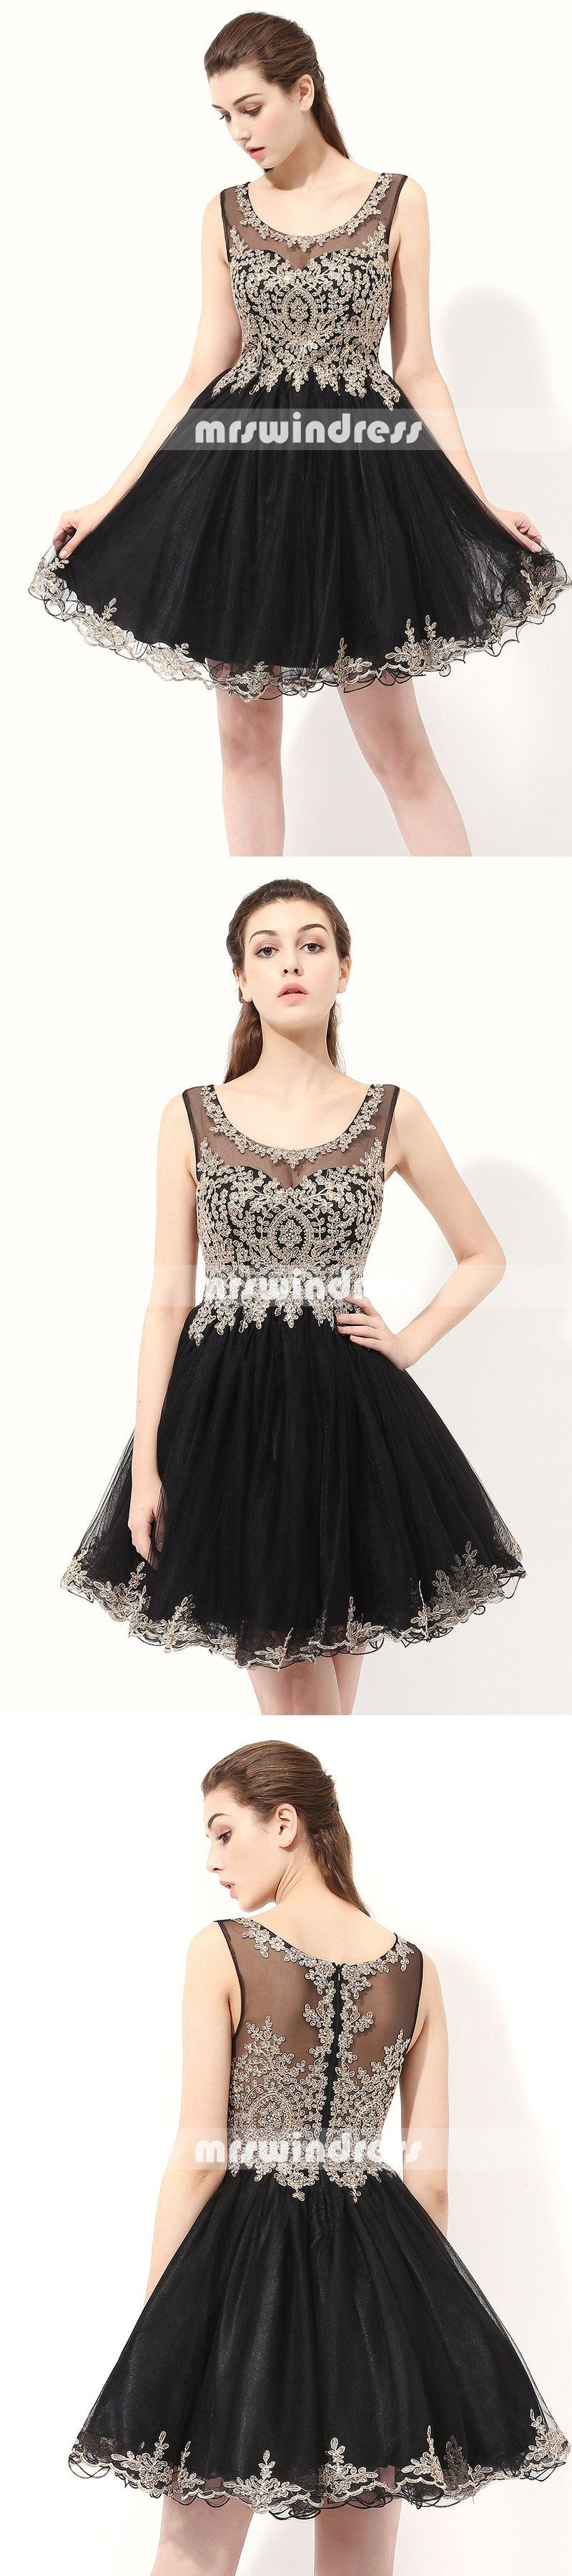 Simple prom dressesvintage prom gownsshort evening dress